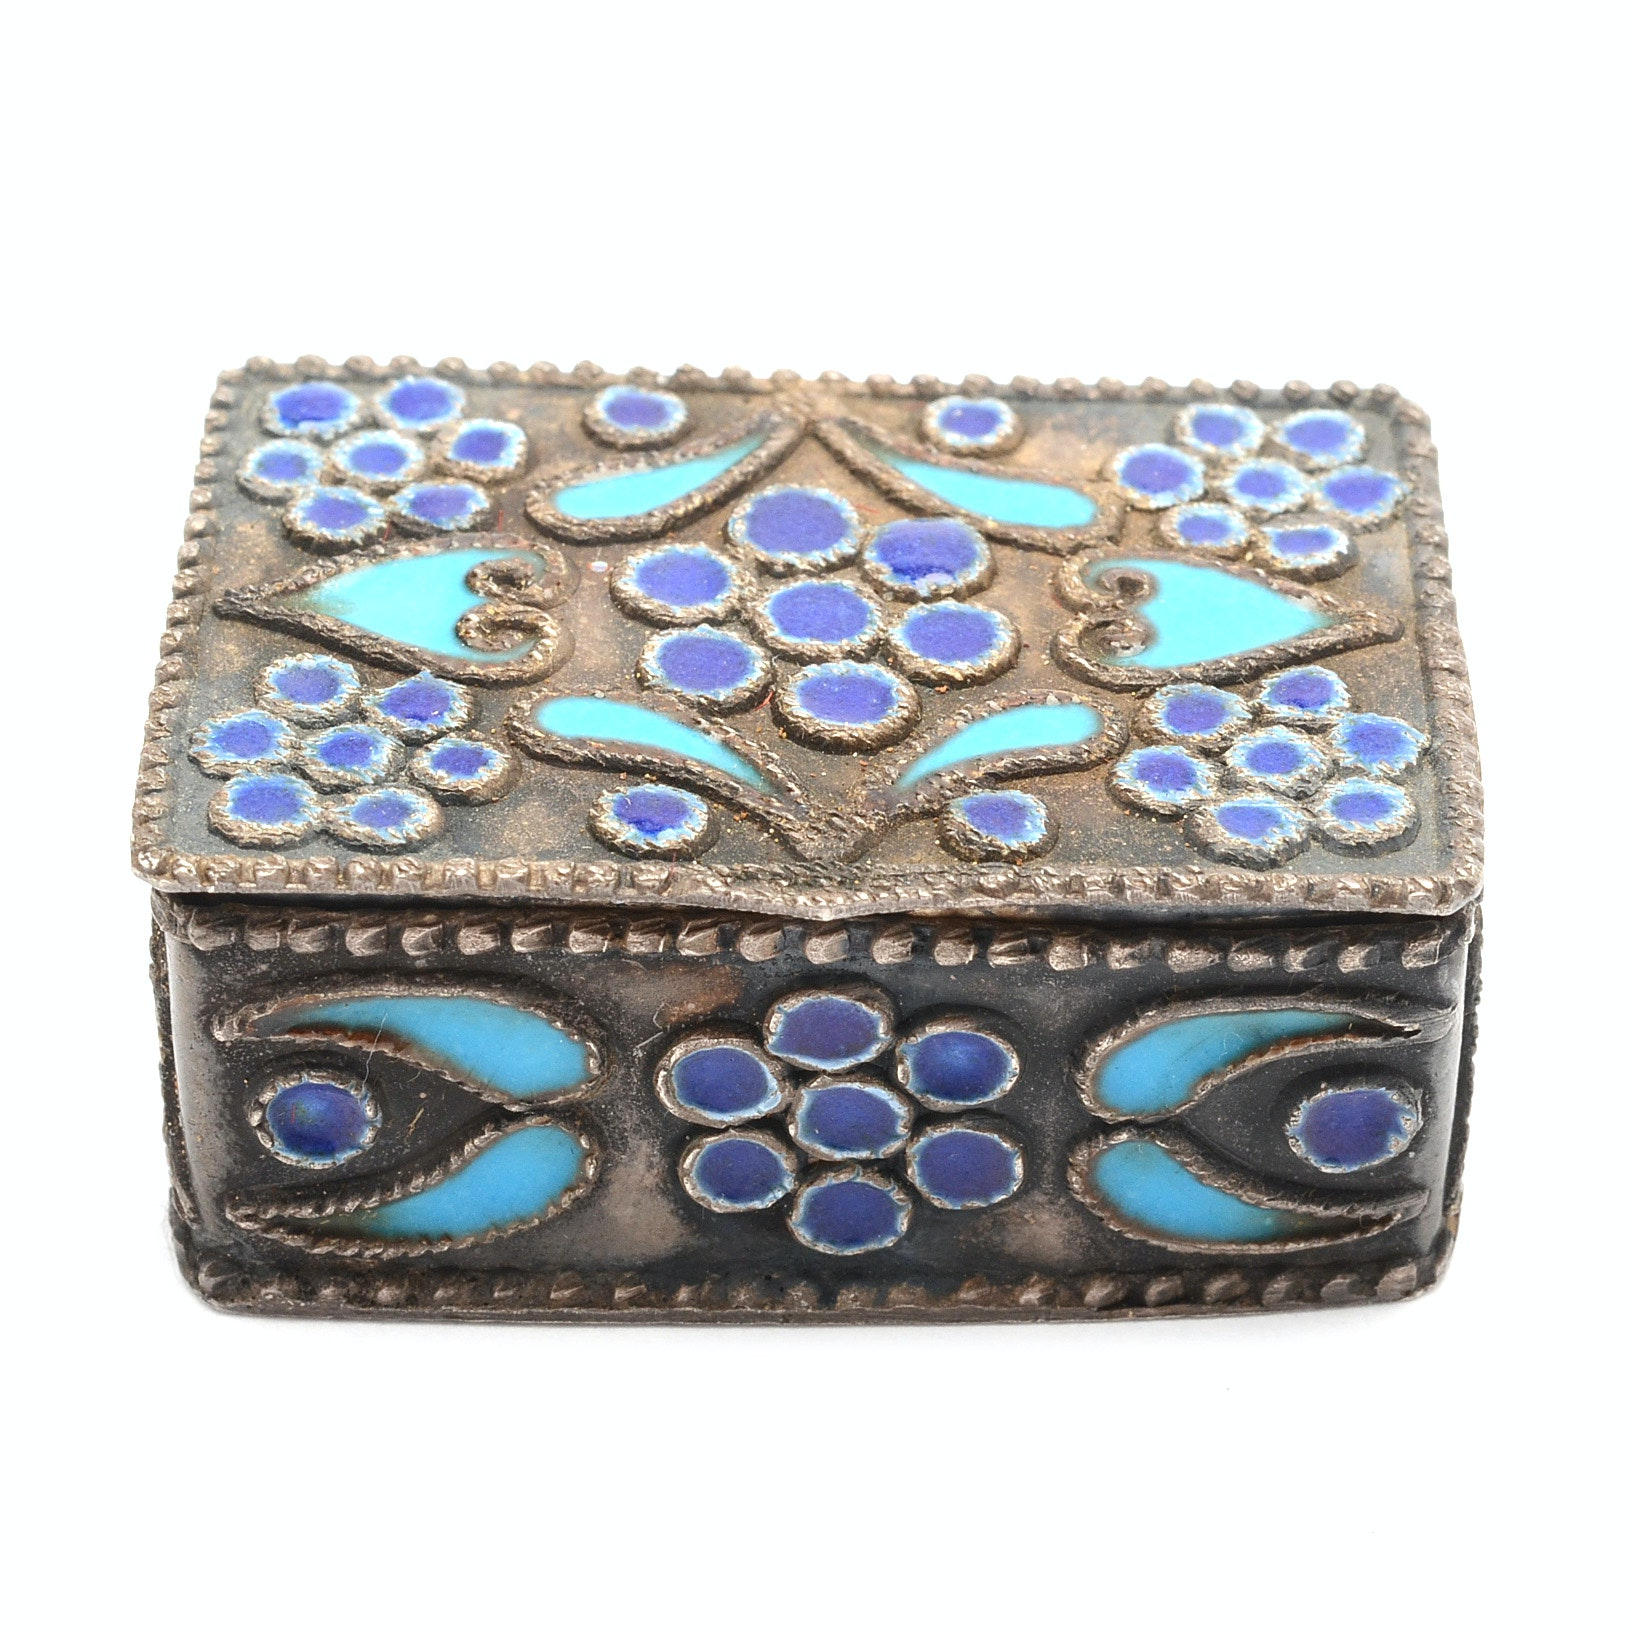 Vintage Sterling Silver Cloisonné Pill Box